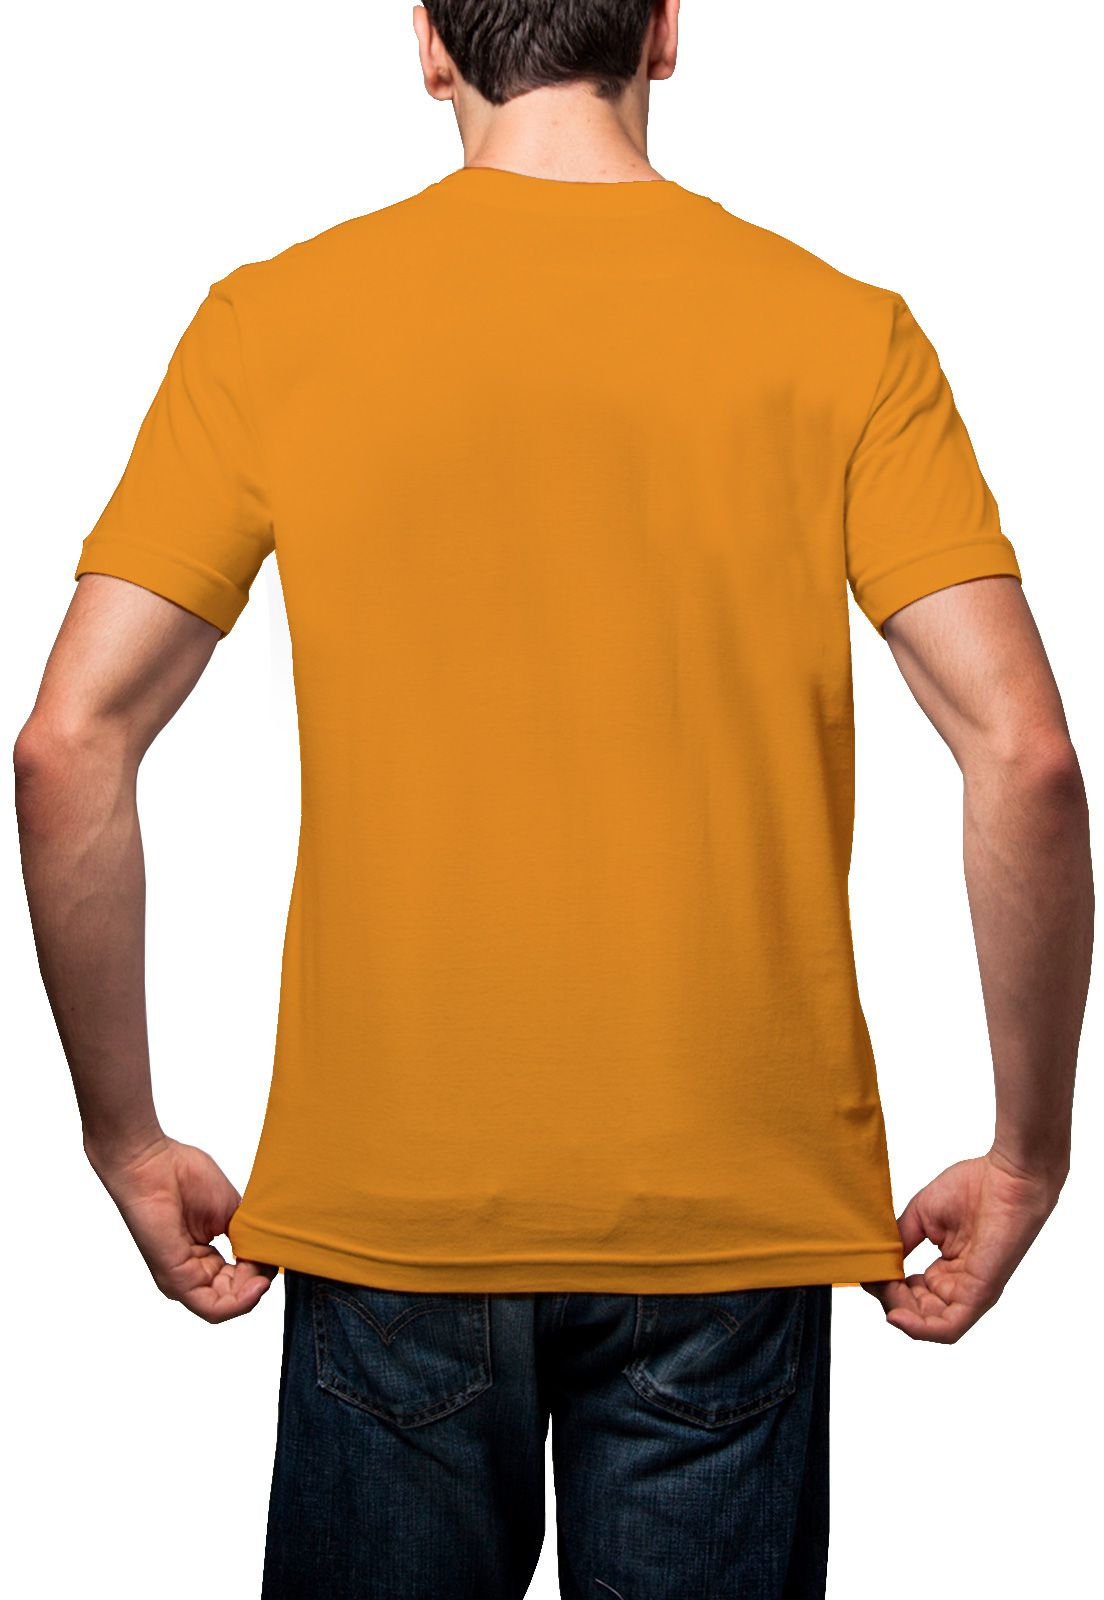 Camiseta Amazônia Básica Árvore Bordada Gola V - Amarelo Escuro